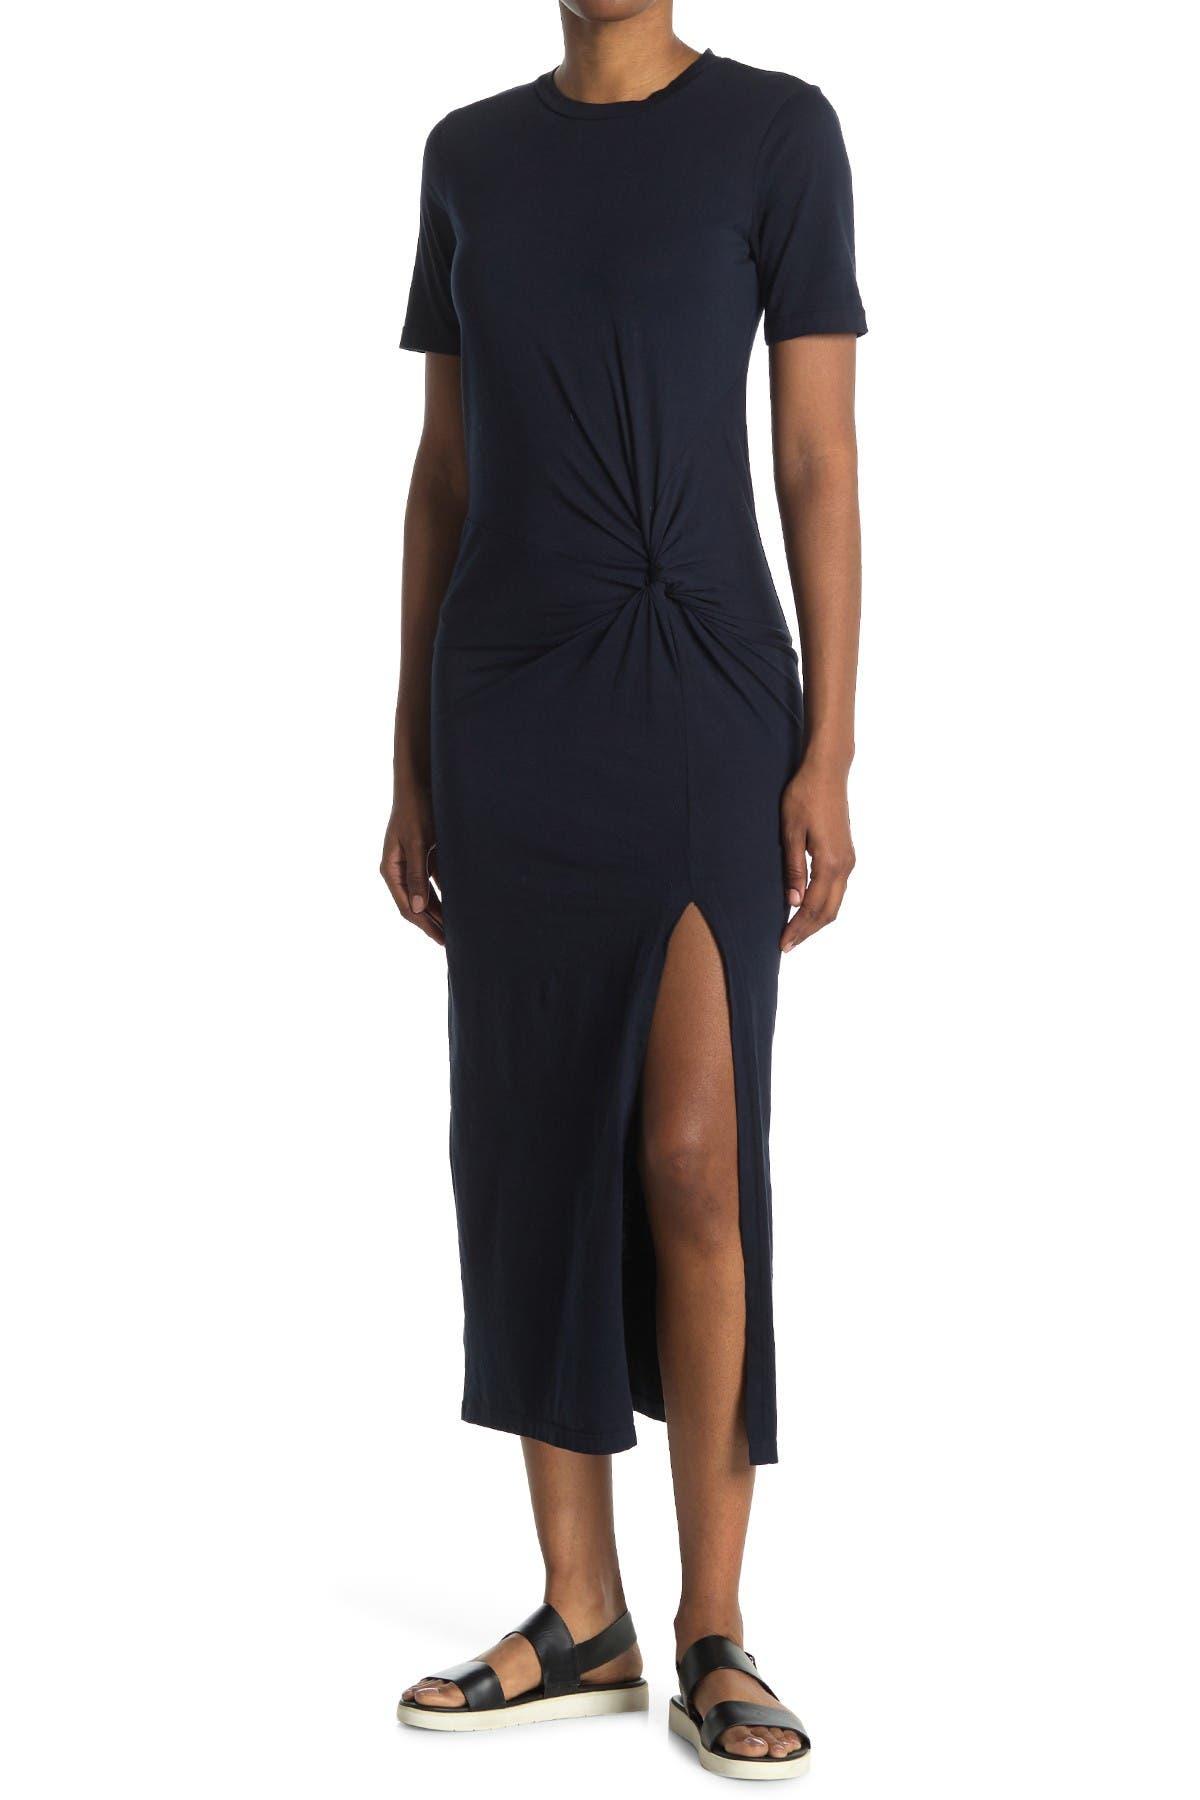 Image of Stateside Twist T-Shirt Maxi Dress